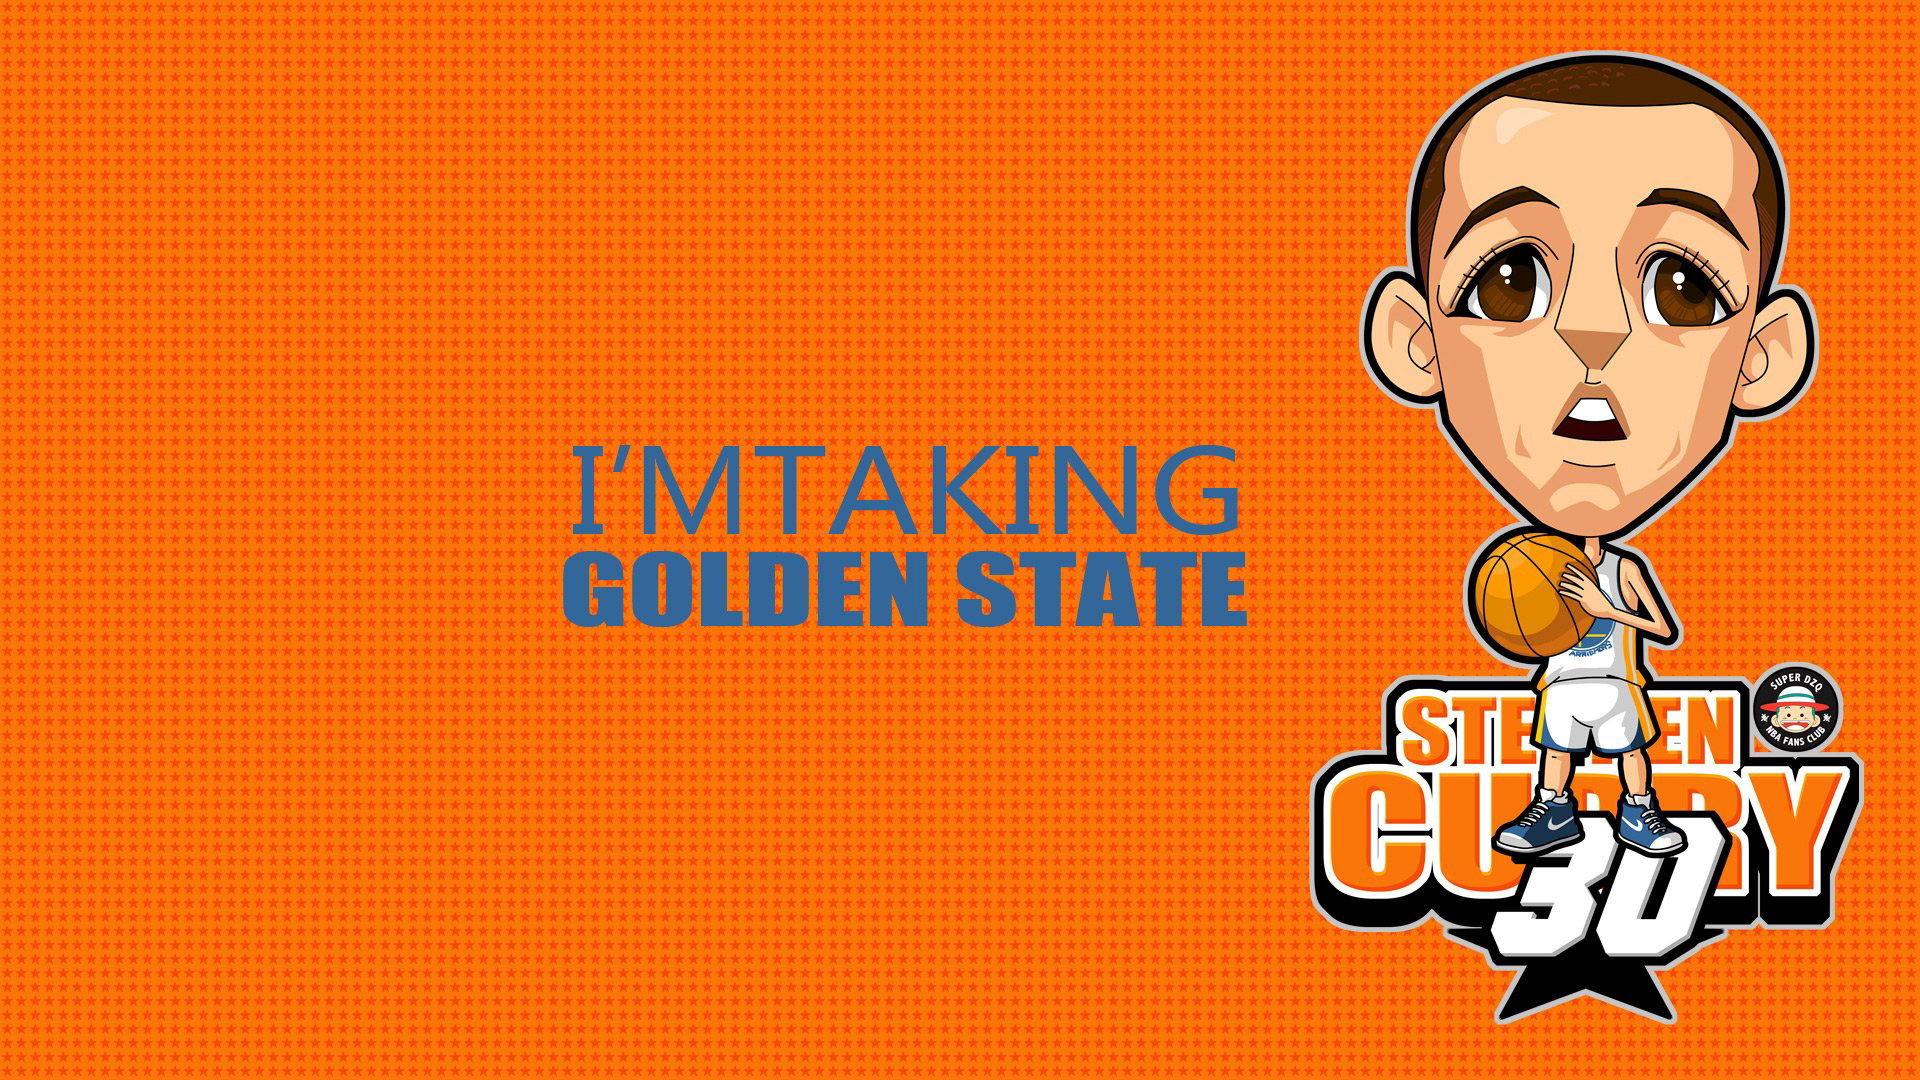 NBA Stephen Curry Cartoon Wallpaper I'm Taking Golden State